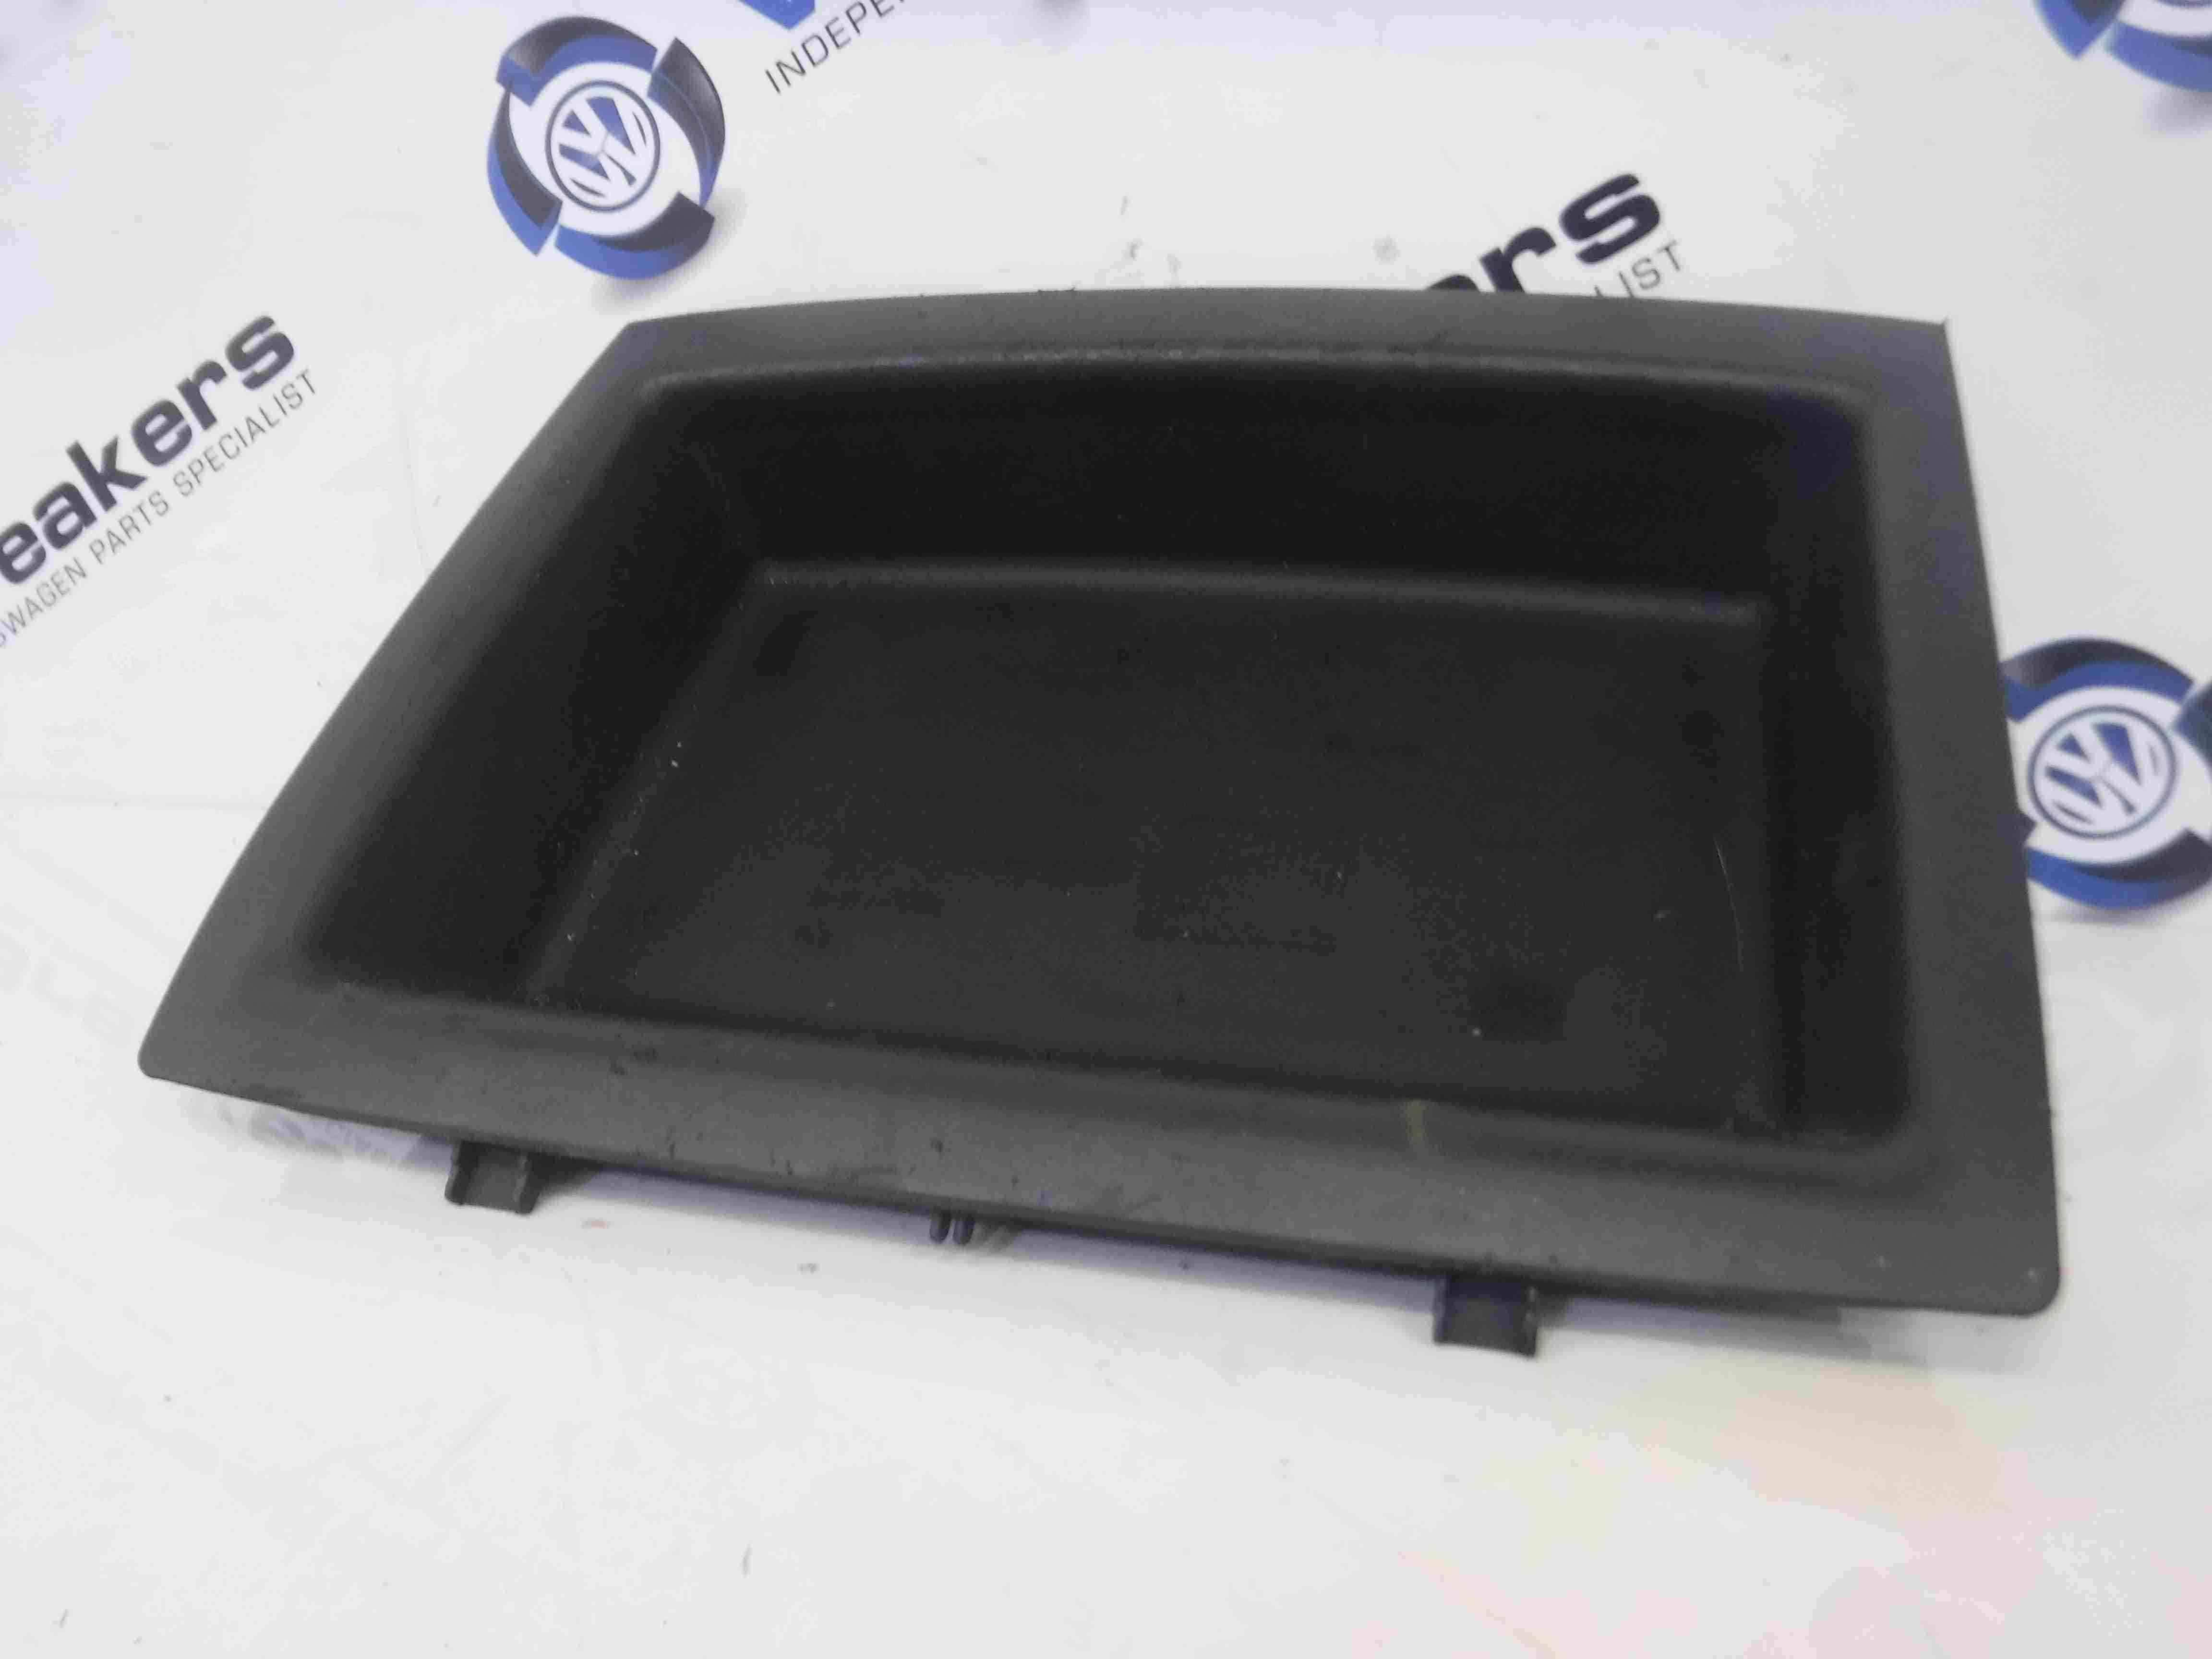 Volkswagen Polo 2003-2006 9N 9N3 Top Dashboard Compartment Mat 6Q0858719a